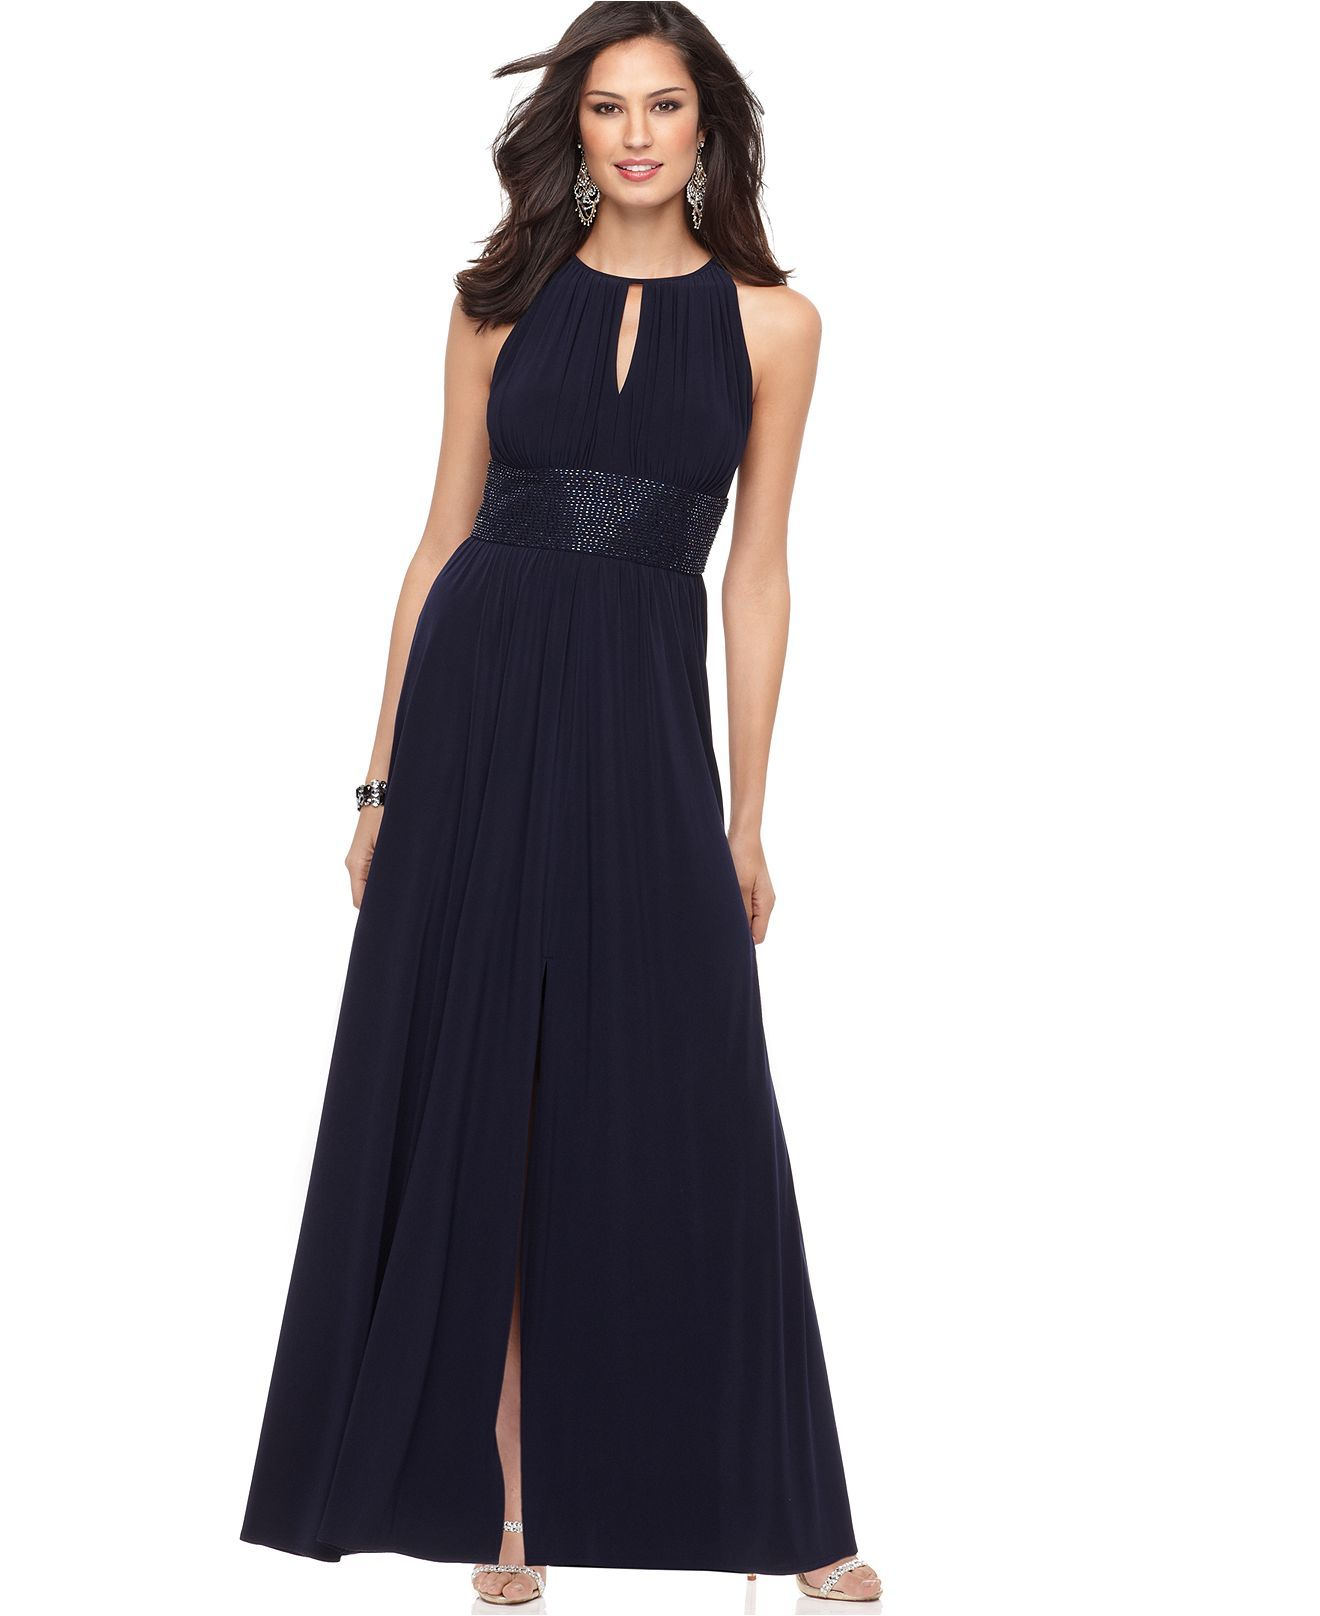 R Richards Dress, Sleeveless Evening Dress - Womens Dresses - Macy\'s ...